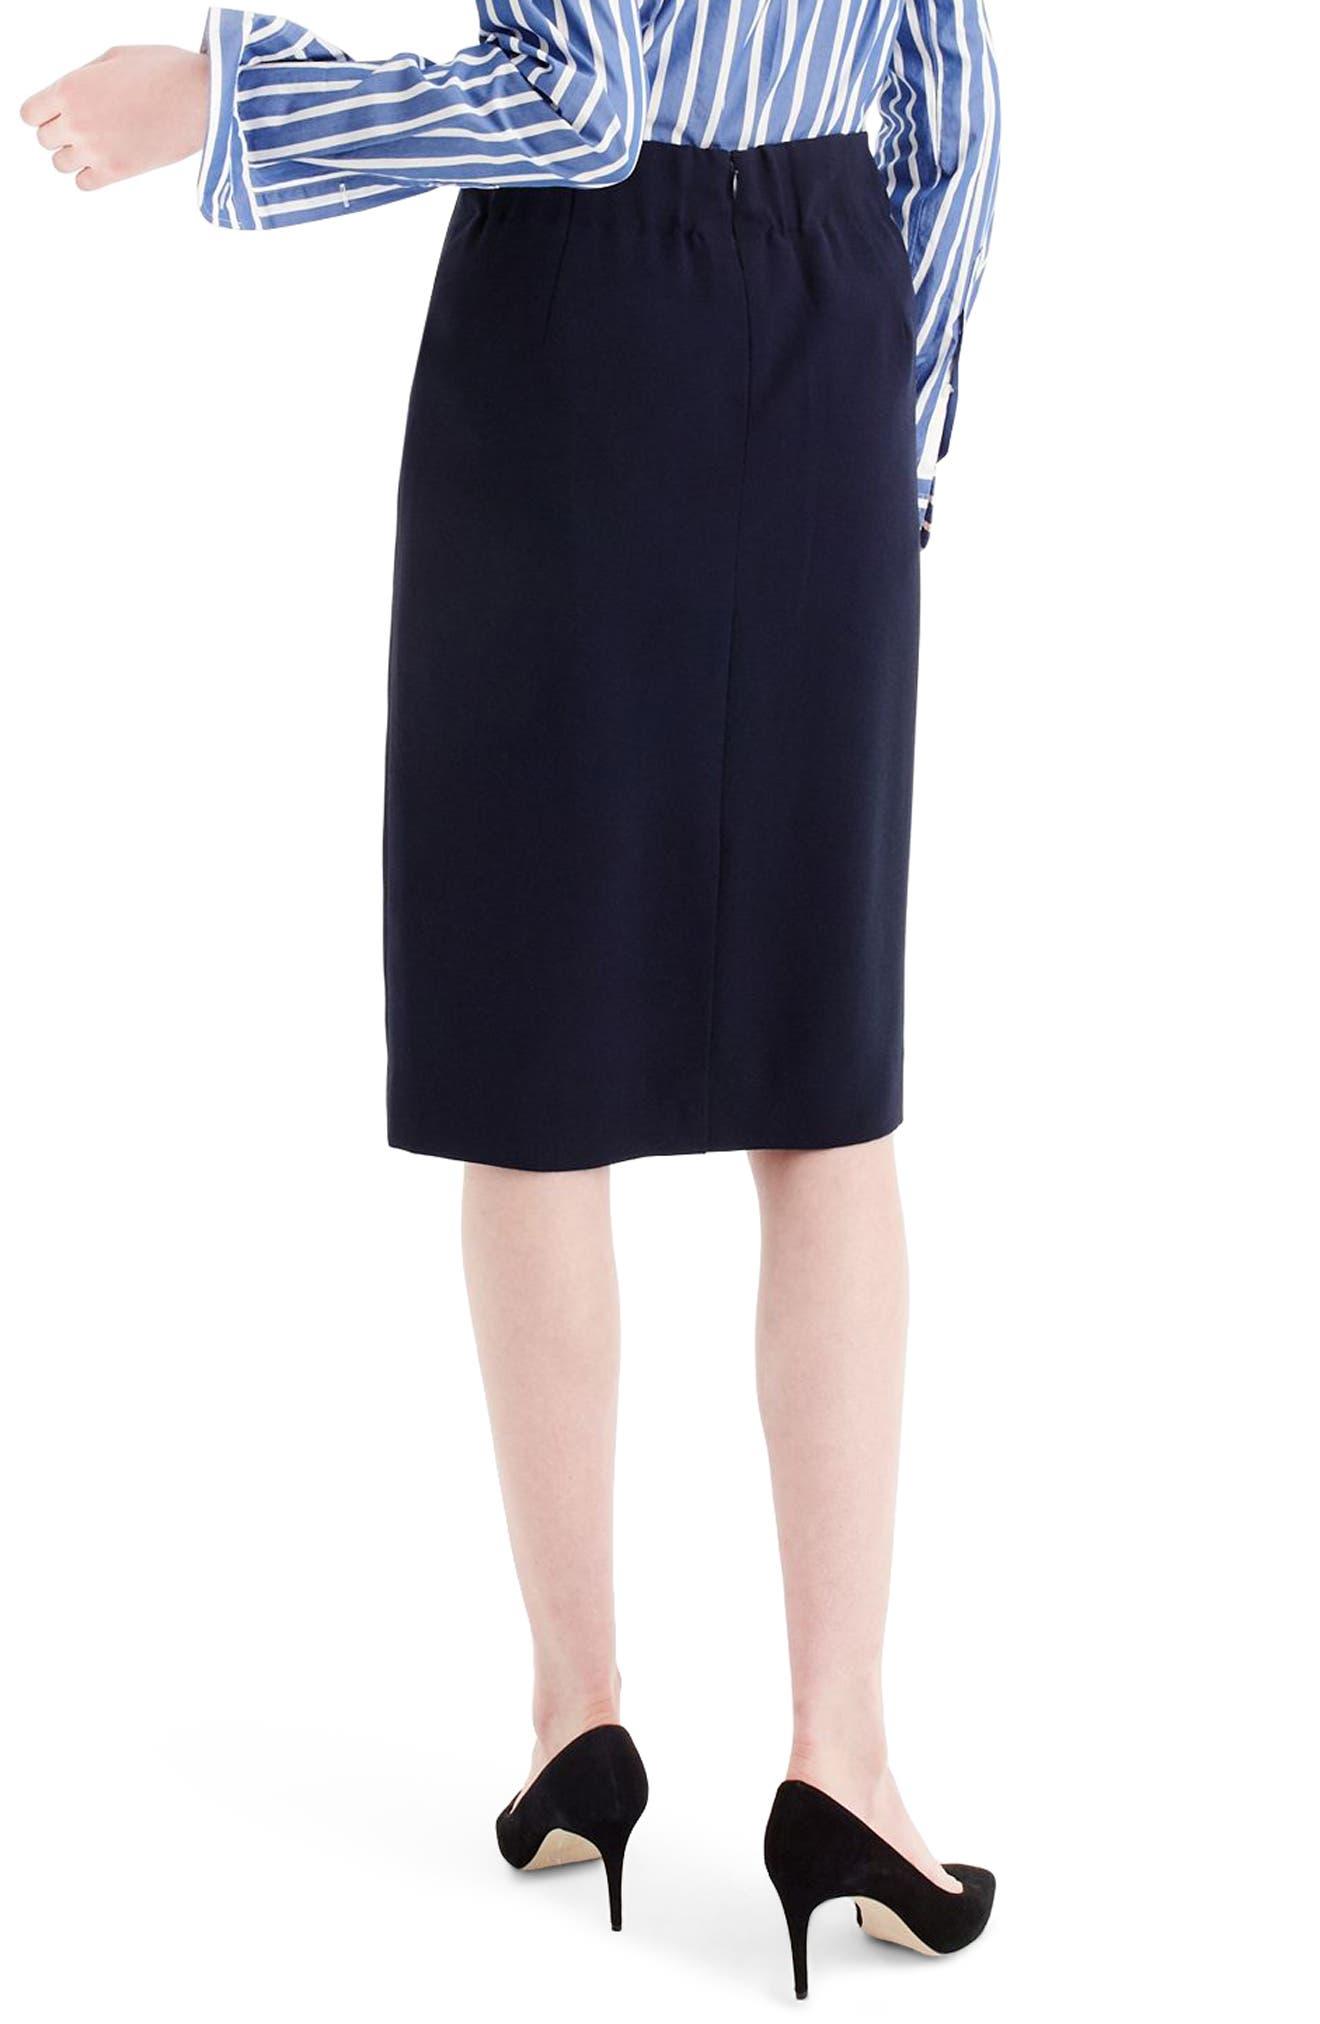 J.Crew 365 Crepe Ruffle Pencil Skirt,                             Alternate thumbnail 2, color,                             Navy